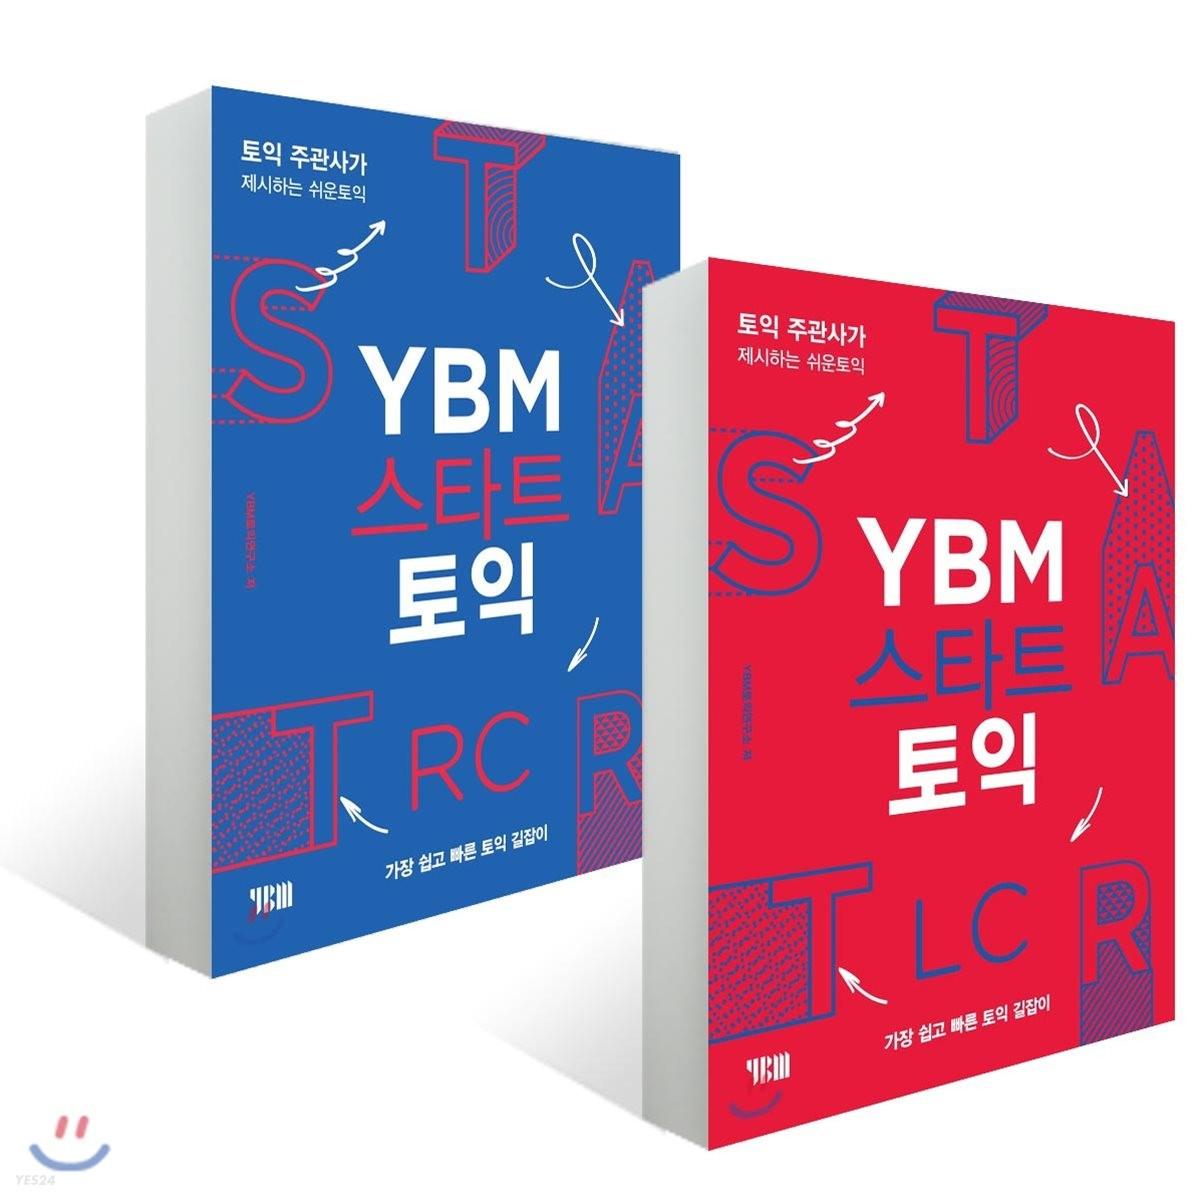 YBM 스타트 토익 RC + LC